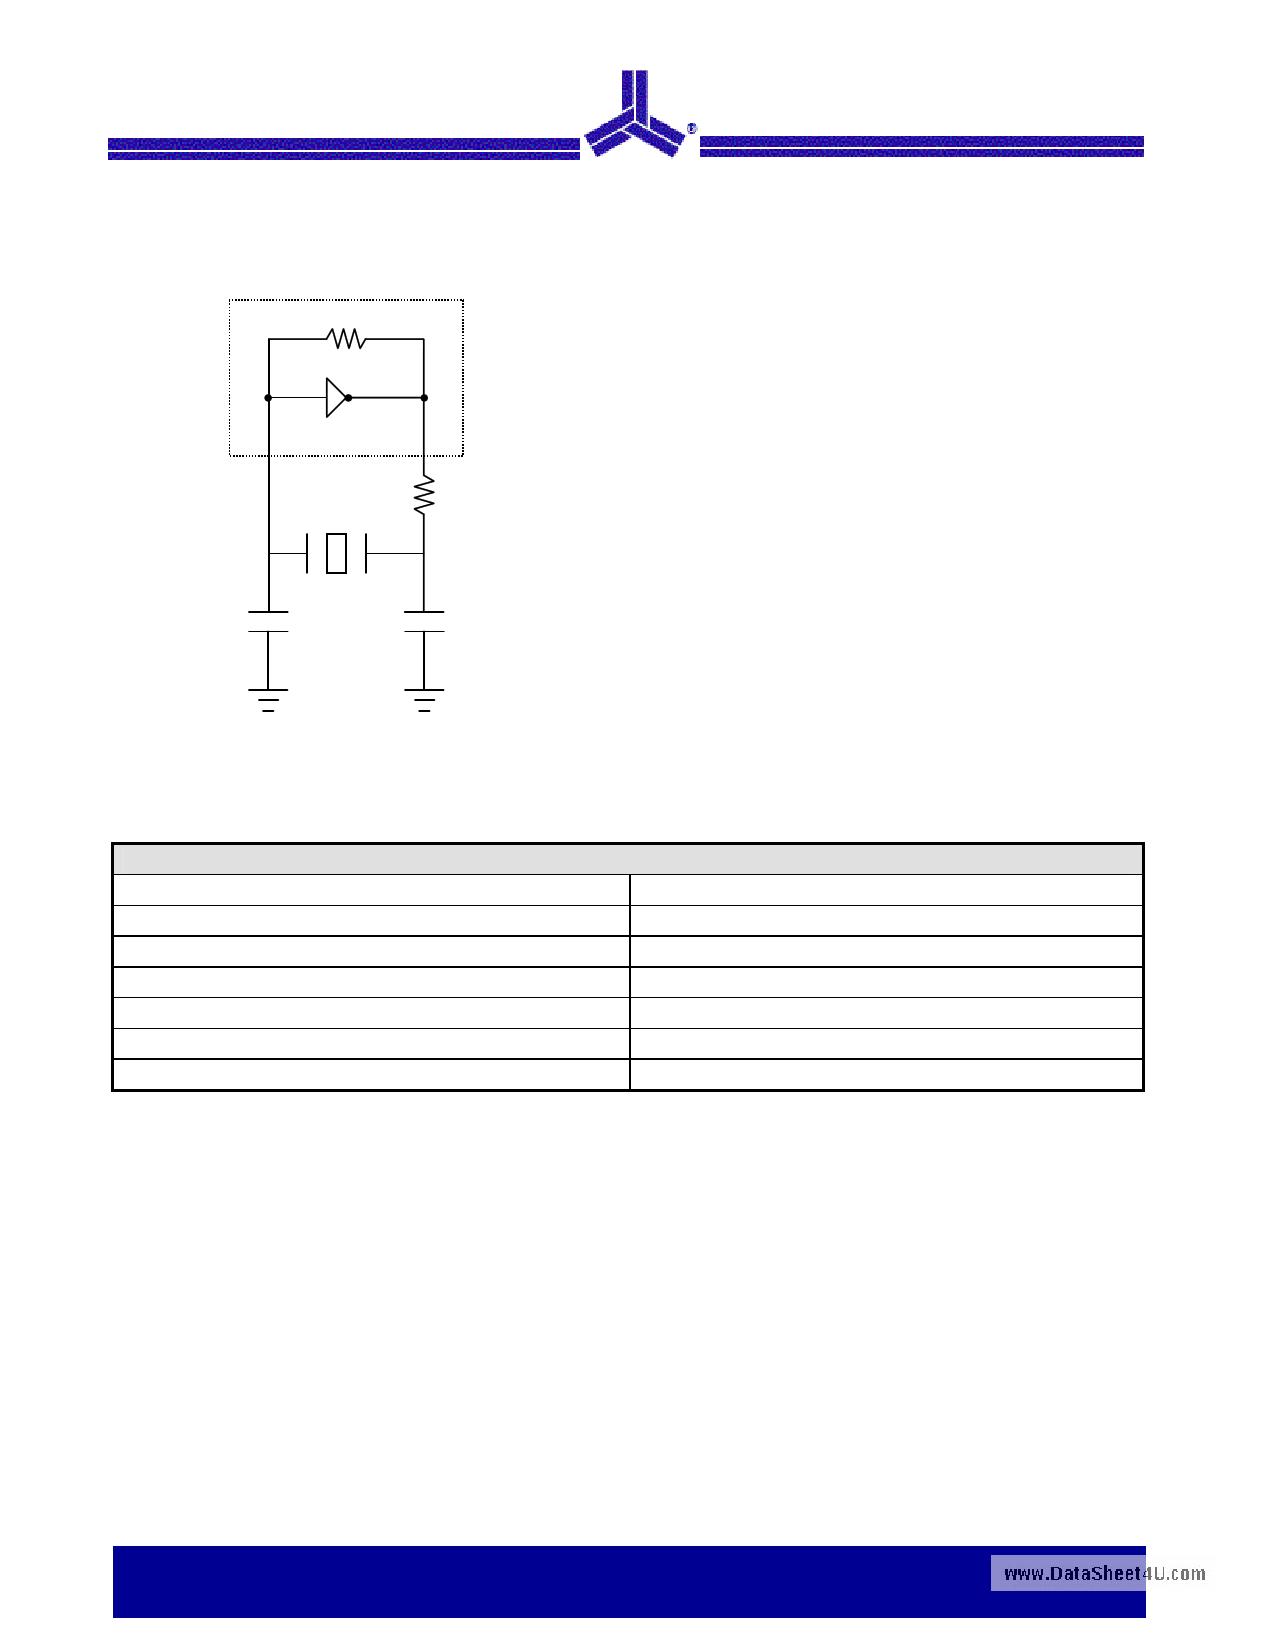 ASM3P2760A 電子部品, 半導体